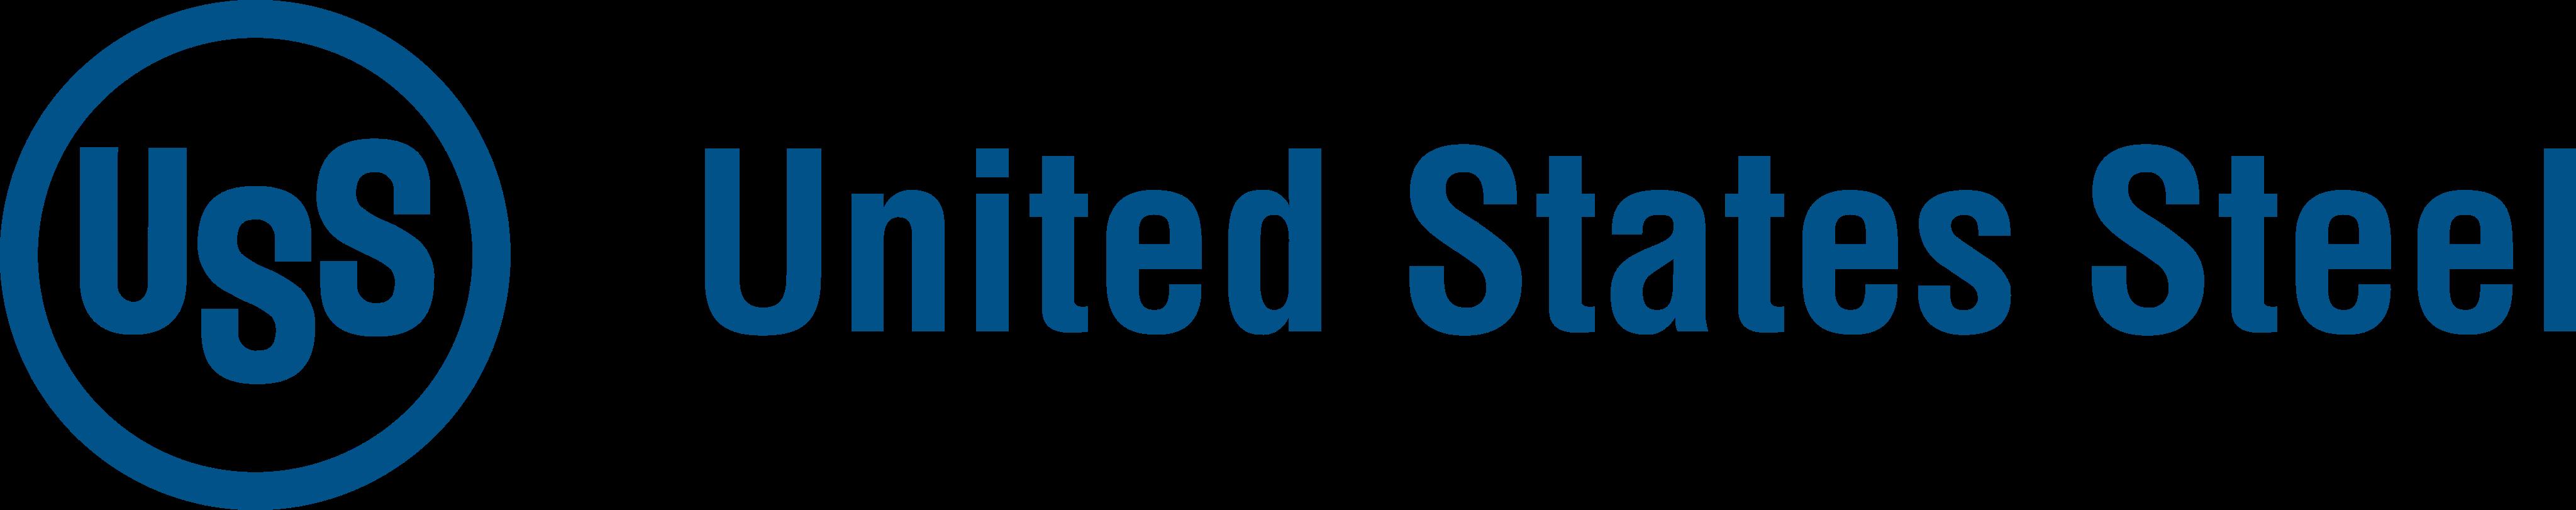 USS Logo - United States Steel Logo.